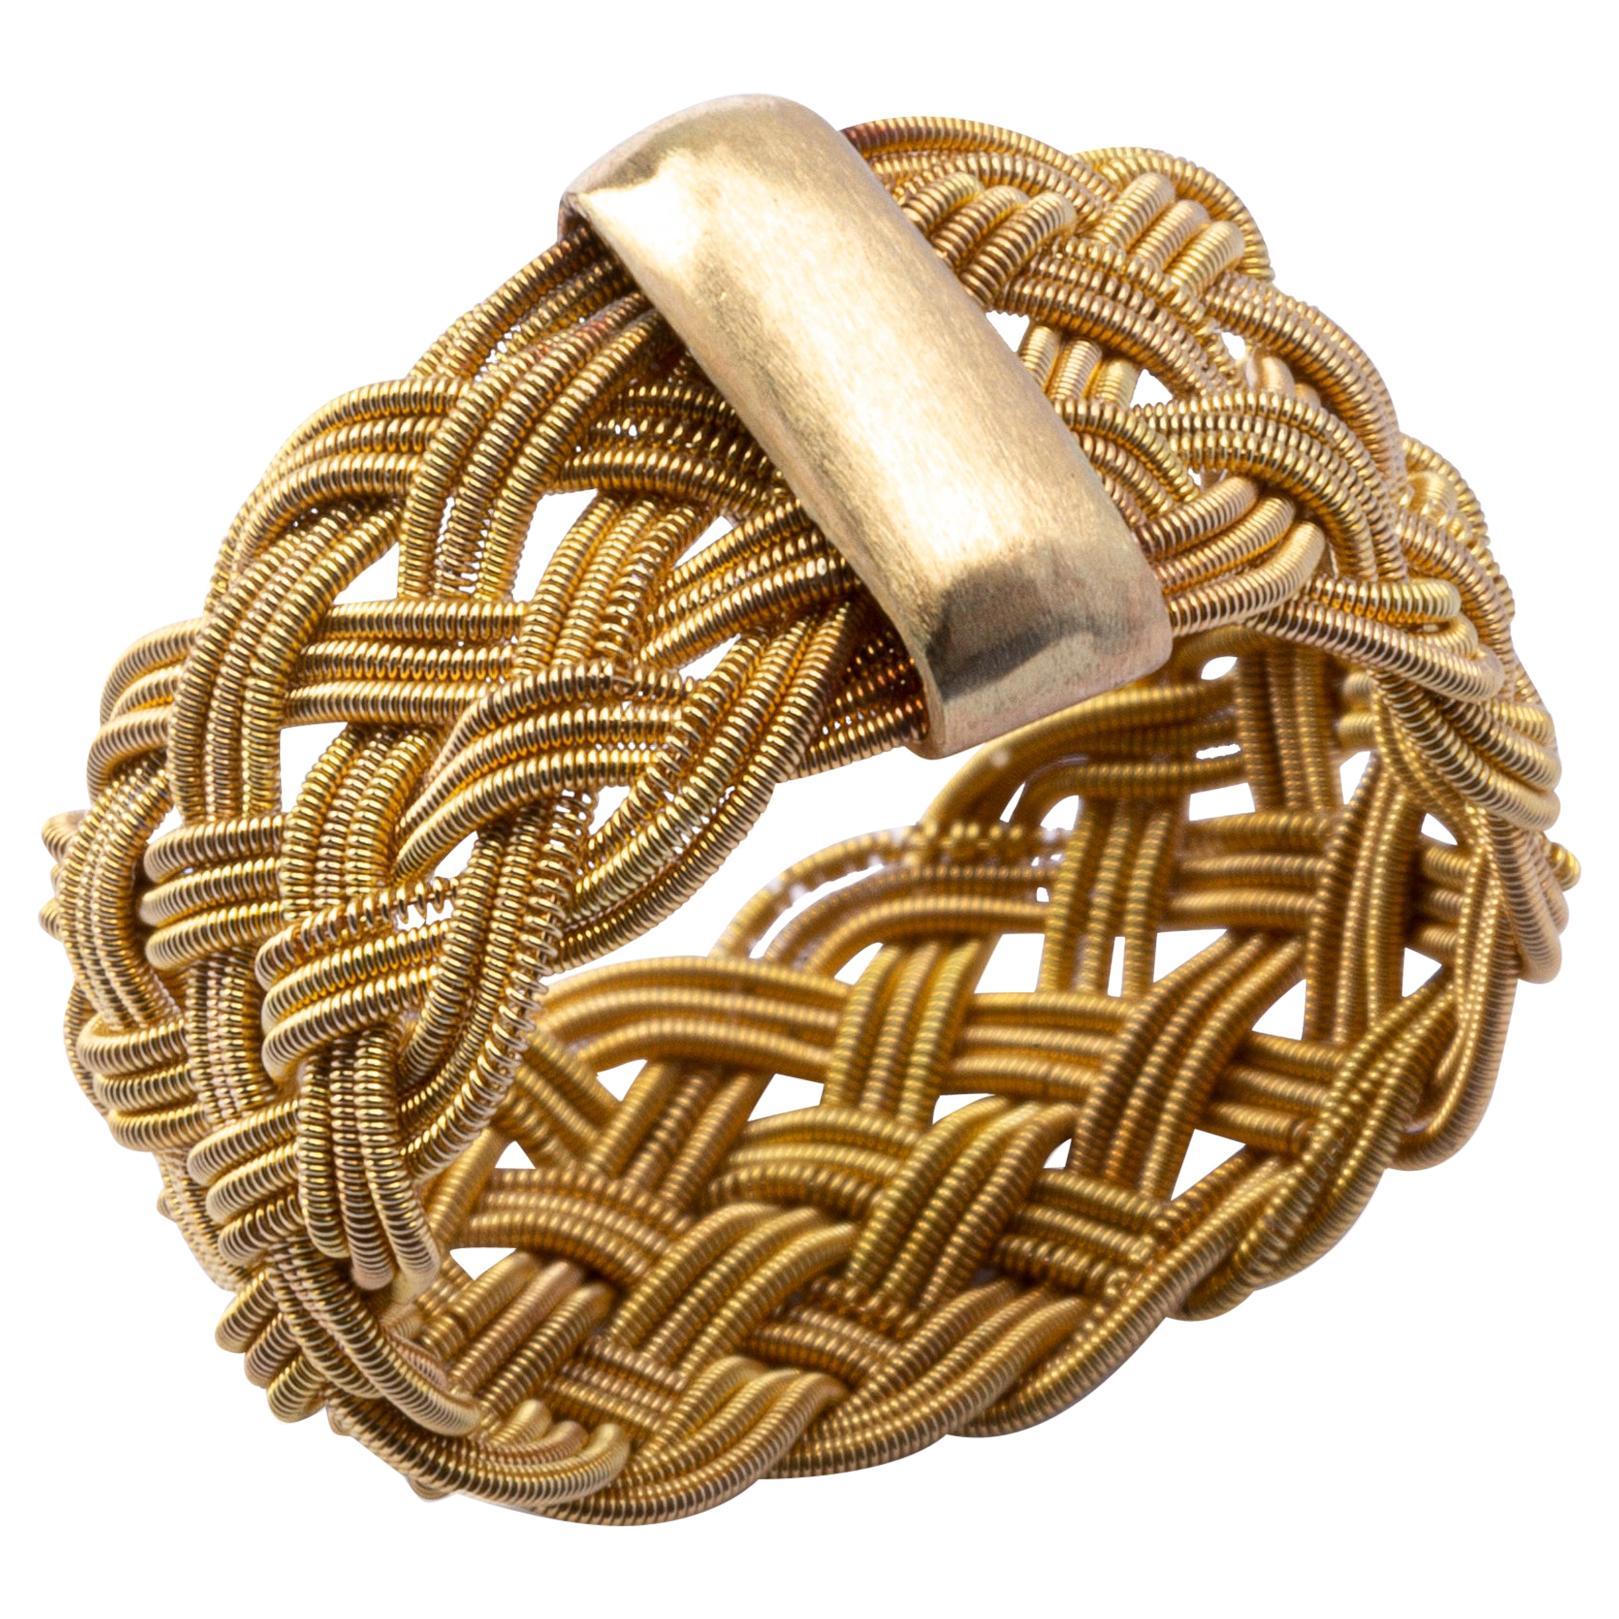 Alex Jona 18 Karat Yellow Gold Filigree Ring Band